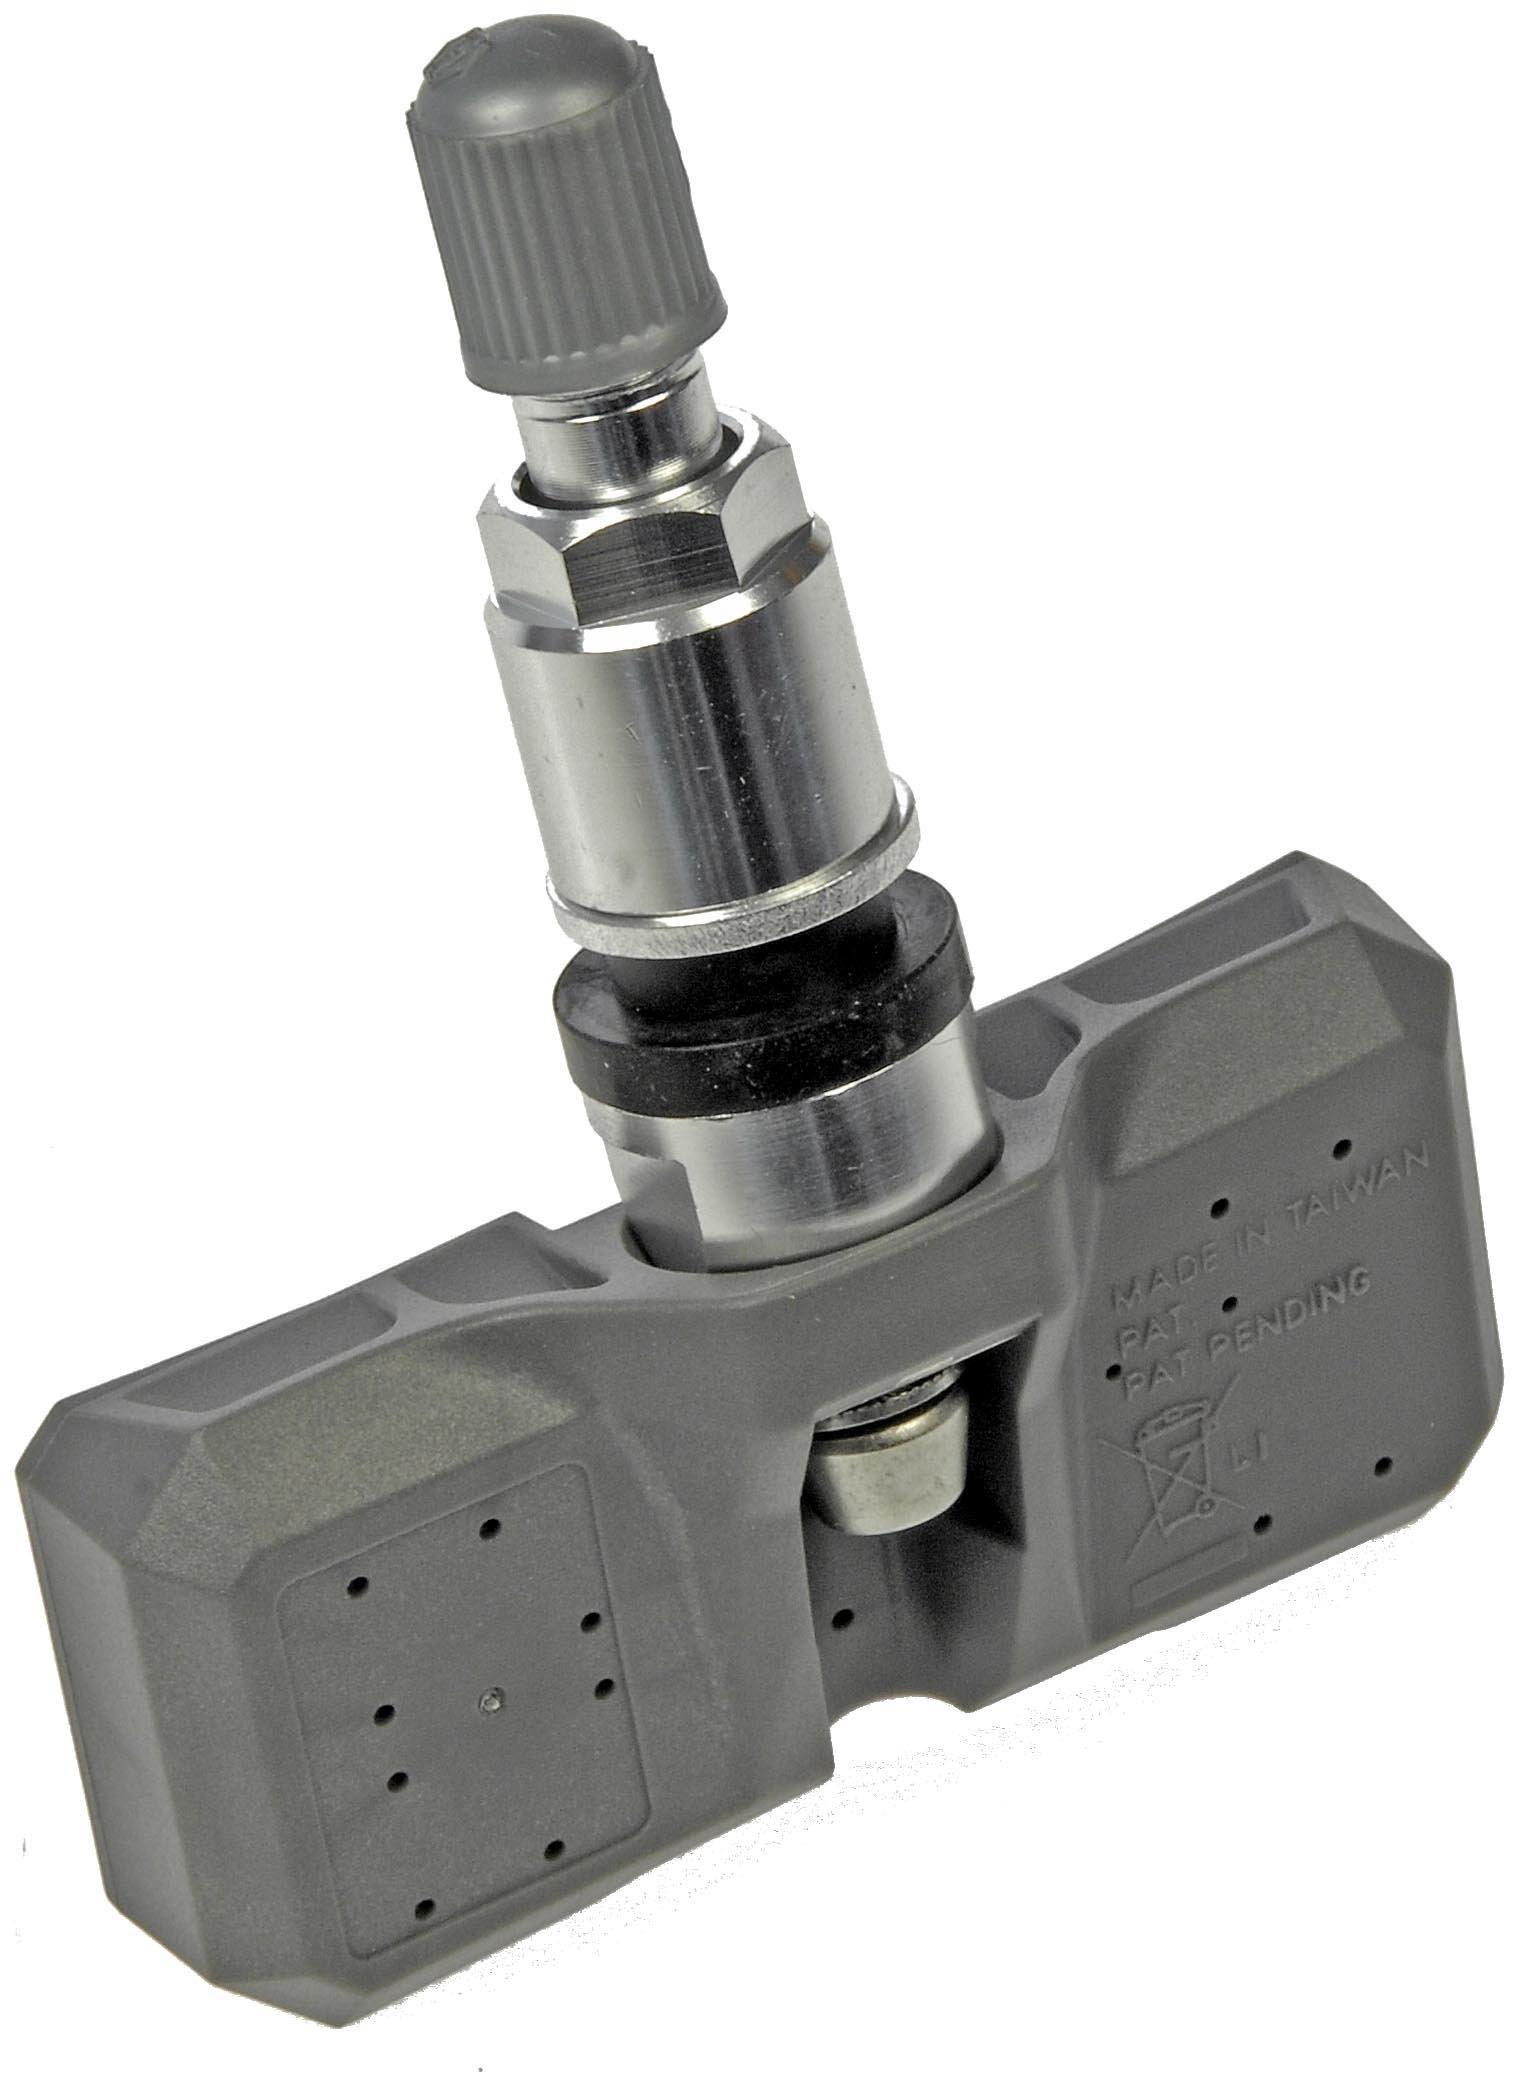 Dorman 974-007 Cadillac/Chevrolet/GMC Tire Pressure Monitor System Sensor by Dorman (Image #3)